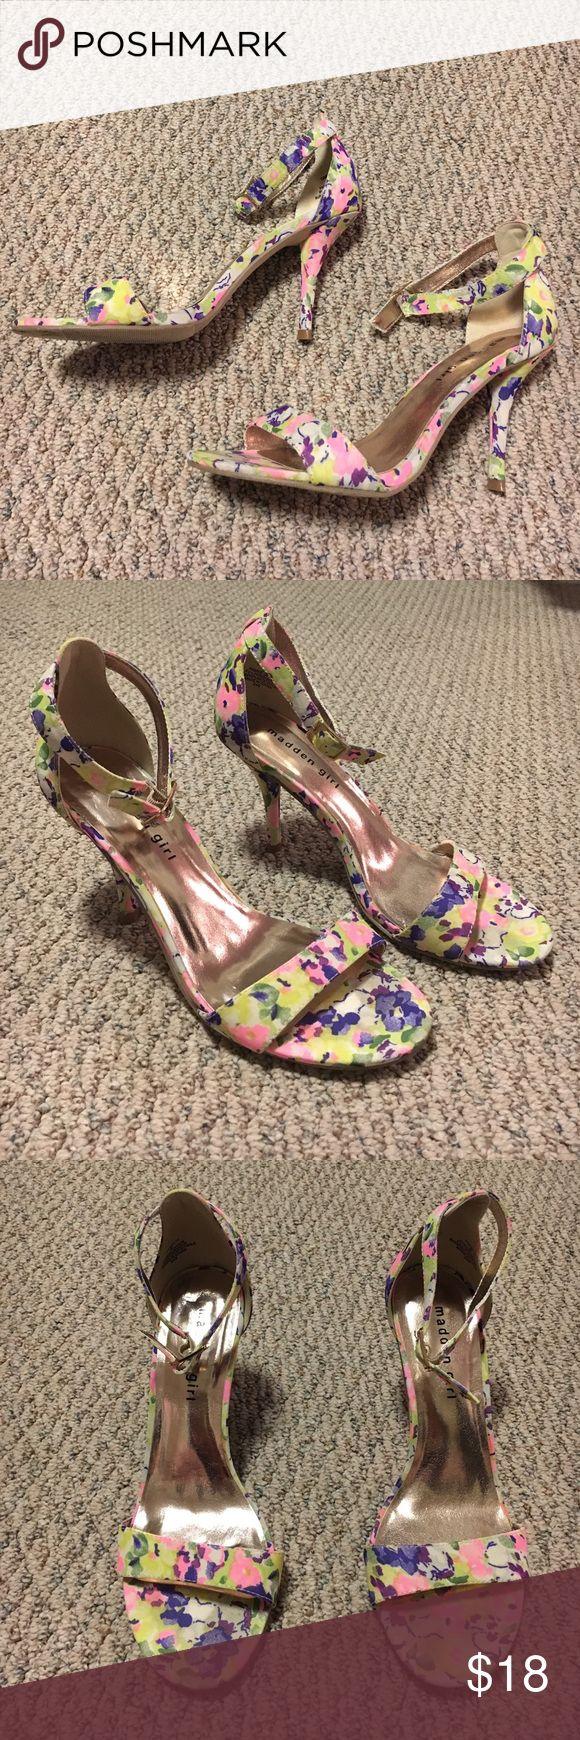 "Springtime Floral Heels Madden Girl ""Darrlin"" heeled sandals with ankle strap. Pretty Floral Madden Girl Shoes Heels"